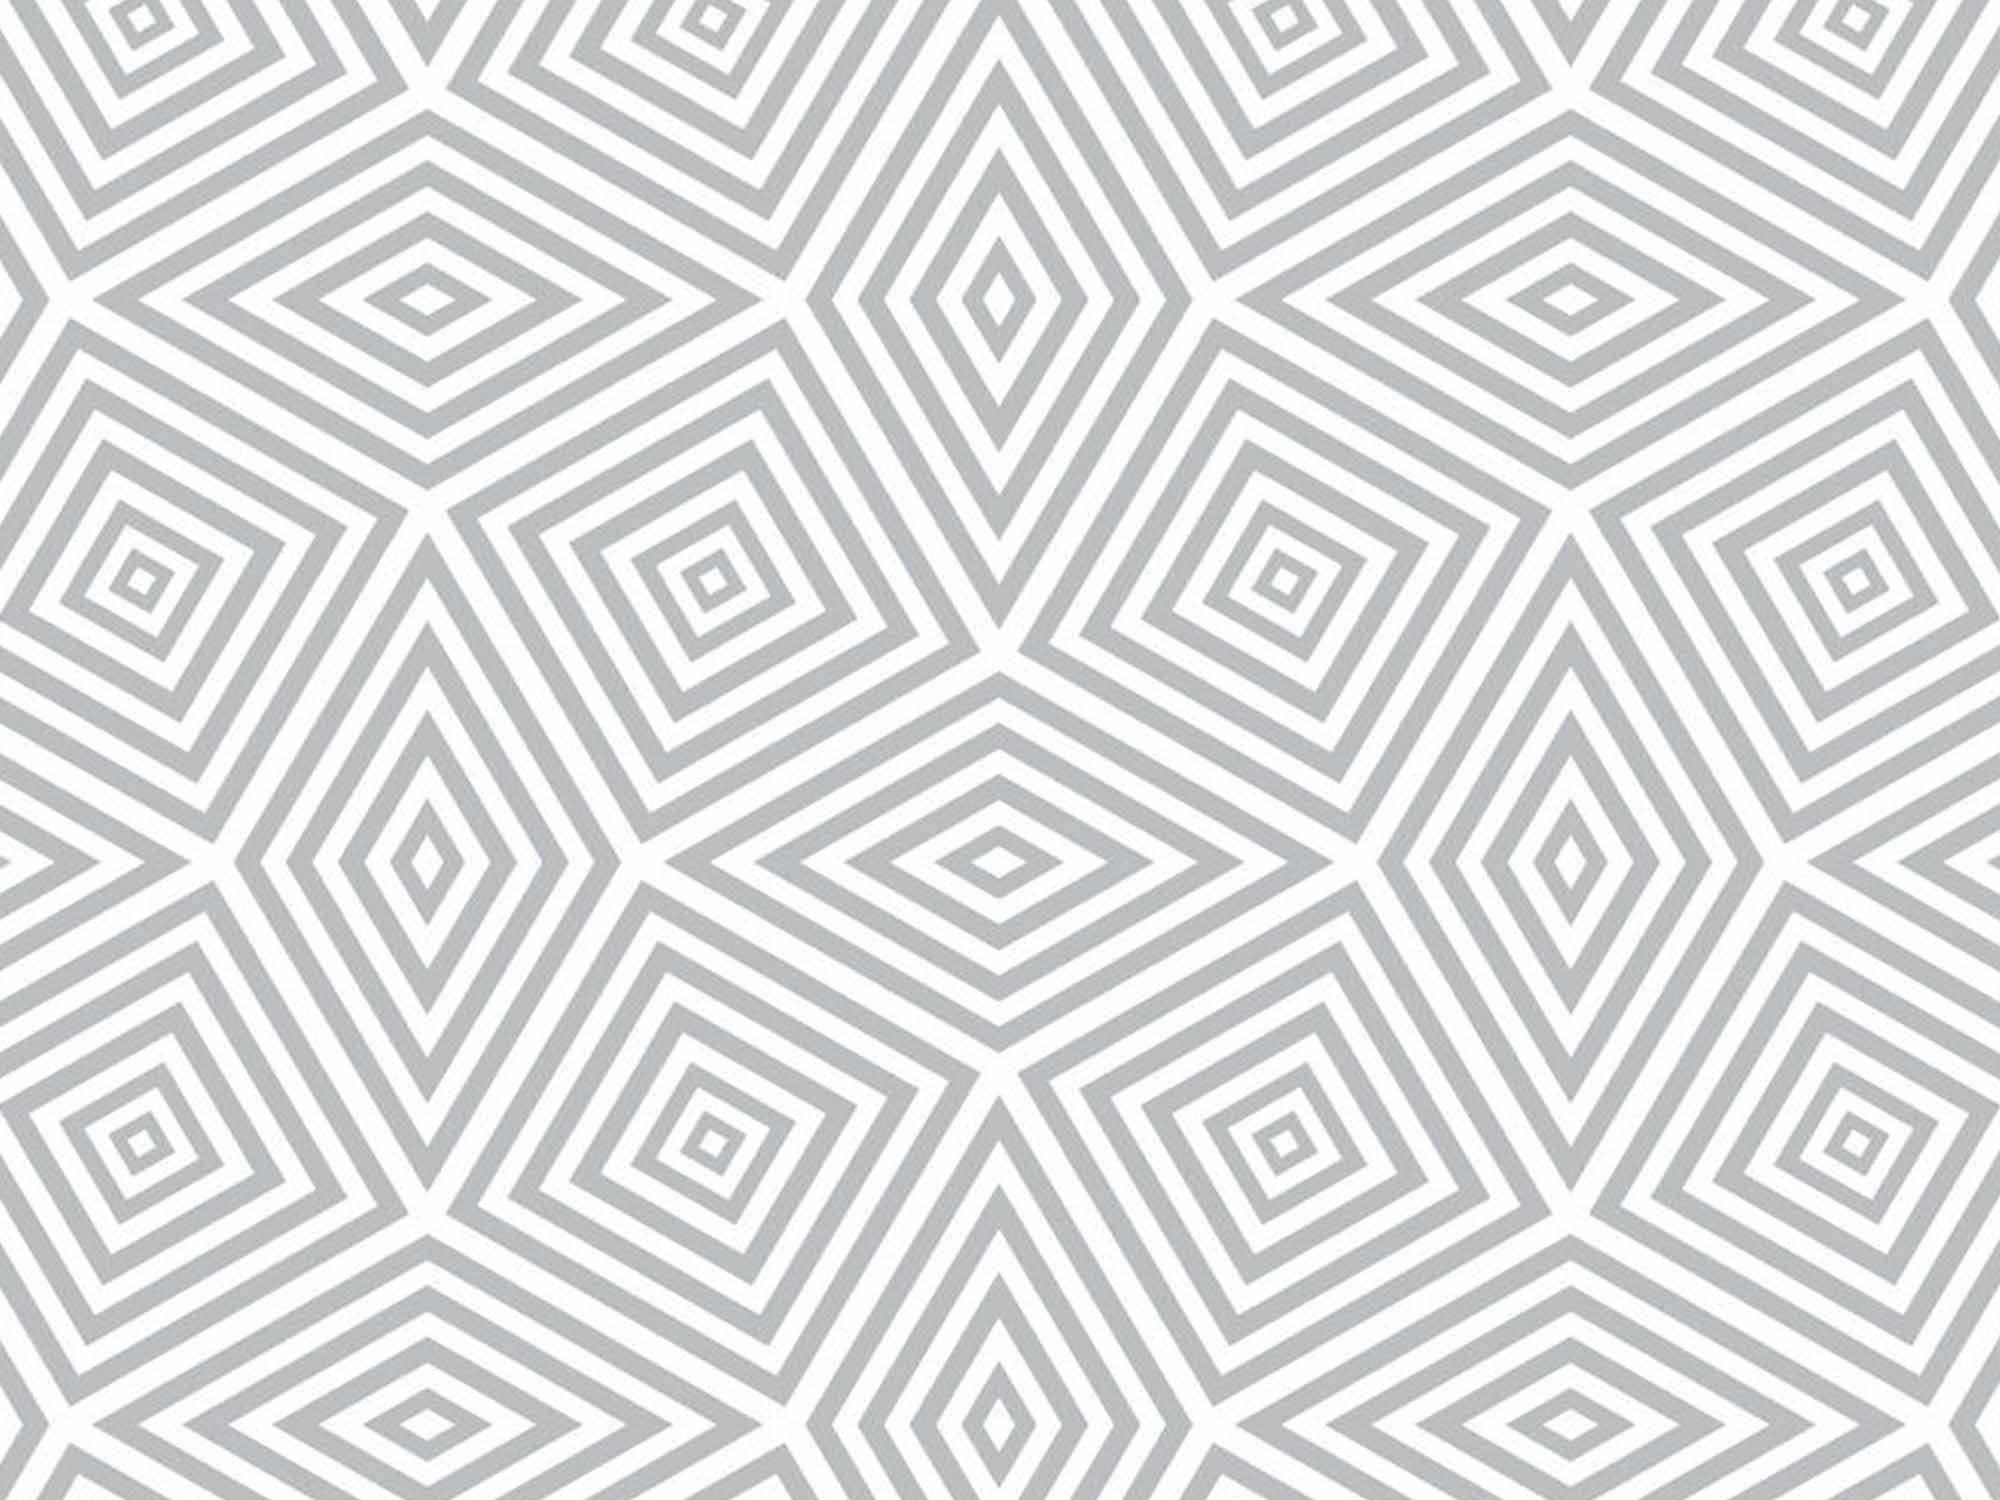 Papel de Parede para Sala Geométrico 0080 - Adesivos de Parede  - Paredes Decoradas